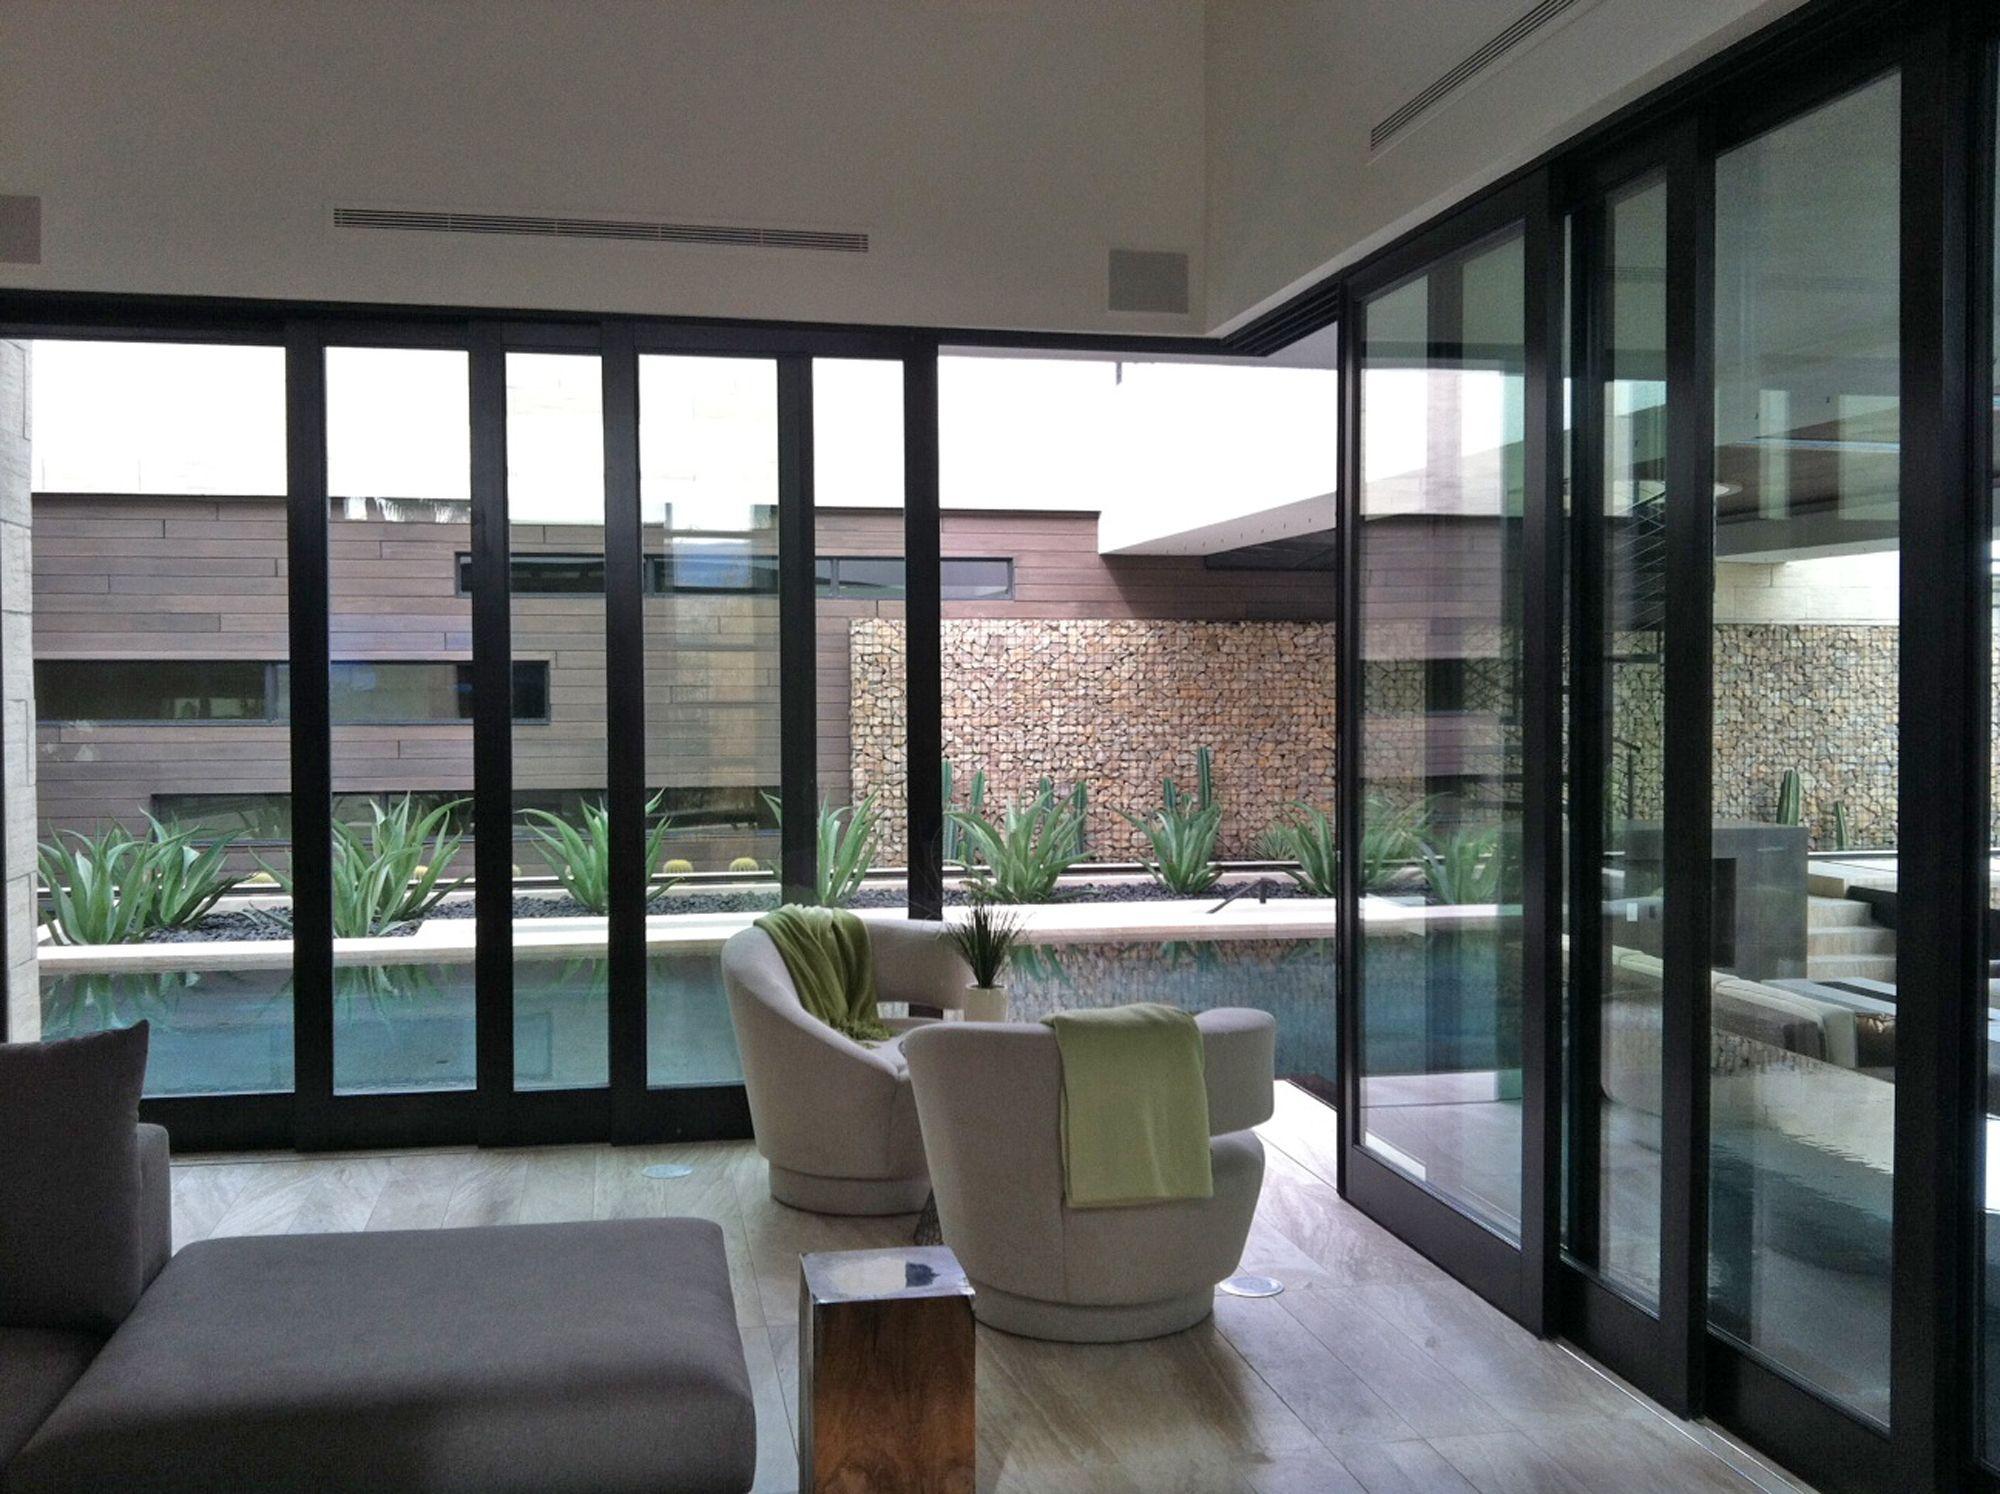 90 Degree Sierra Pacific Multi Slide Pocketing Doors Windows And Doors Sliding Patio Doors Sliding Glass Door